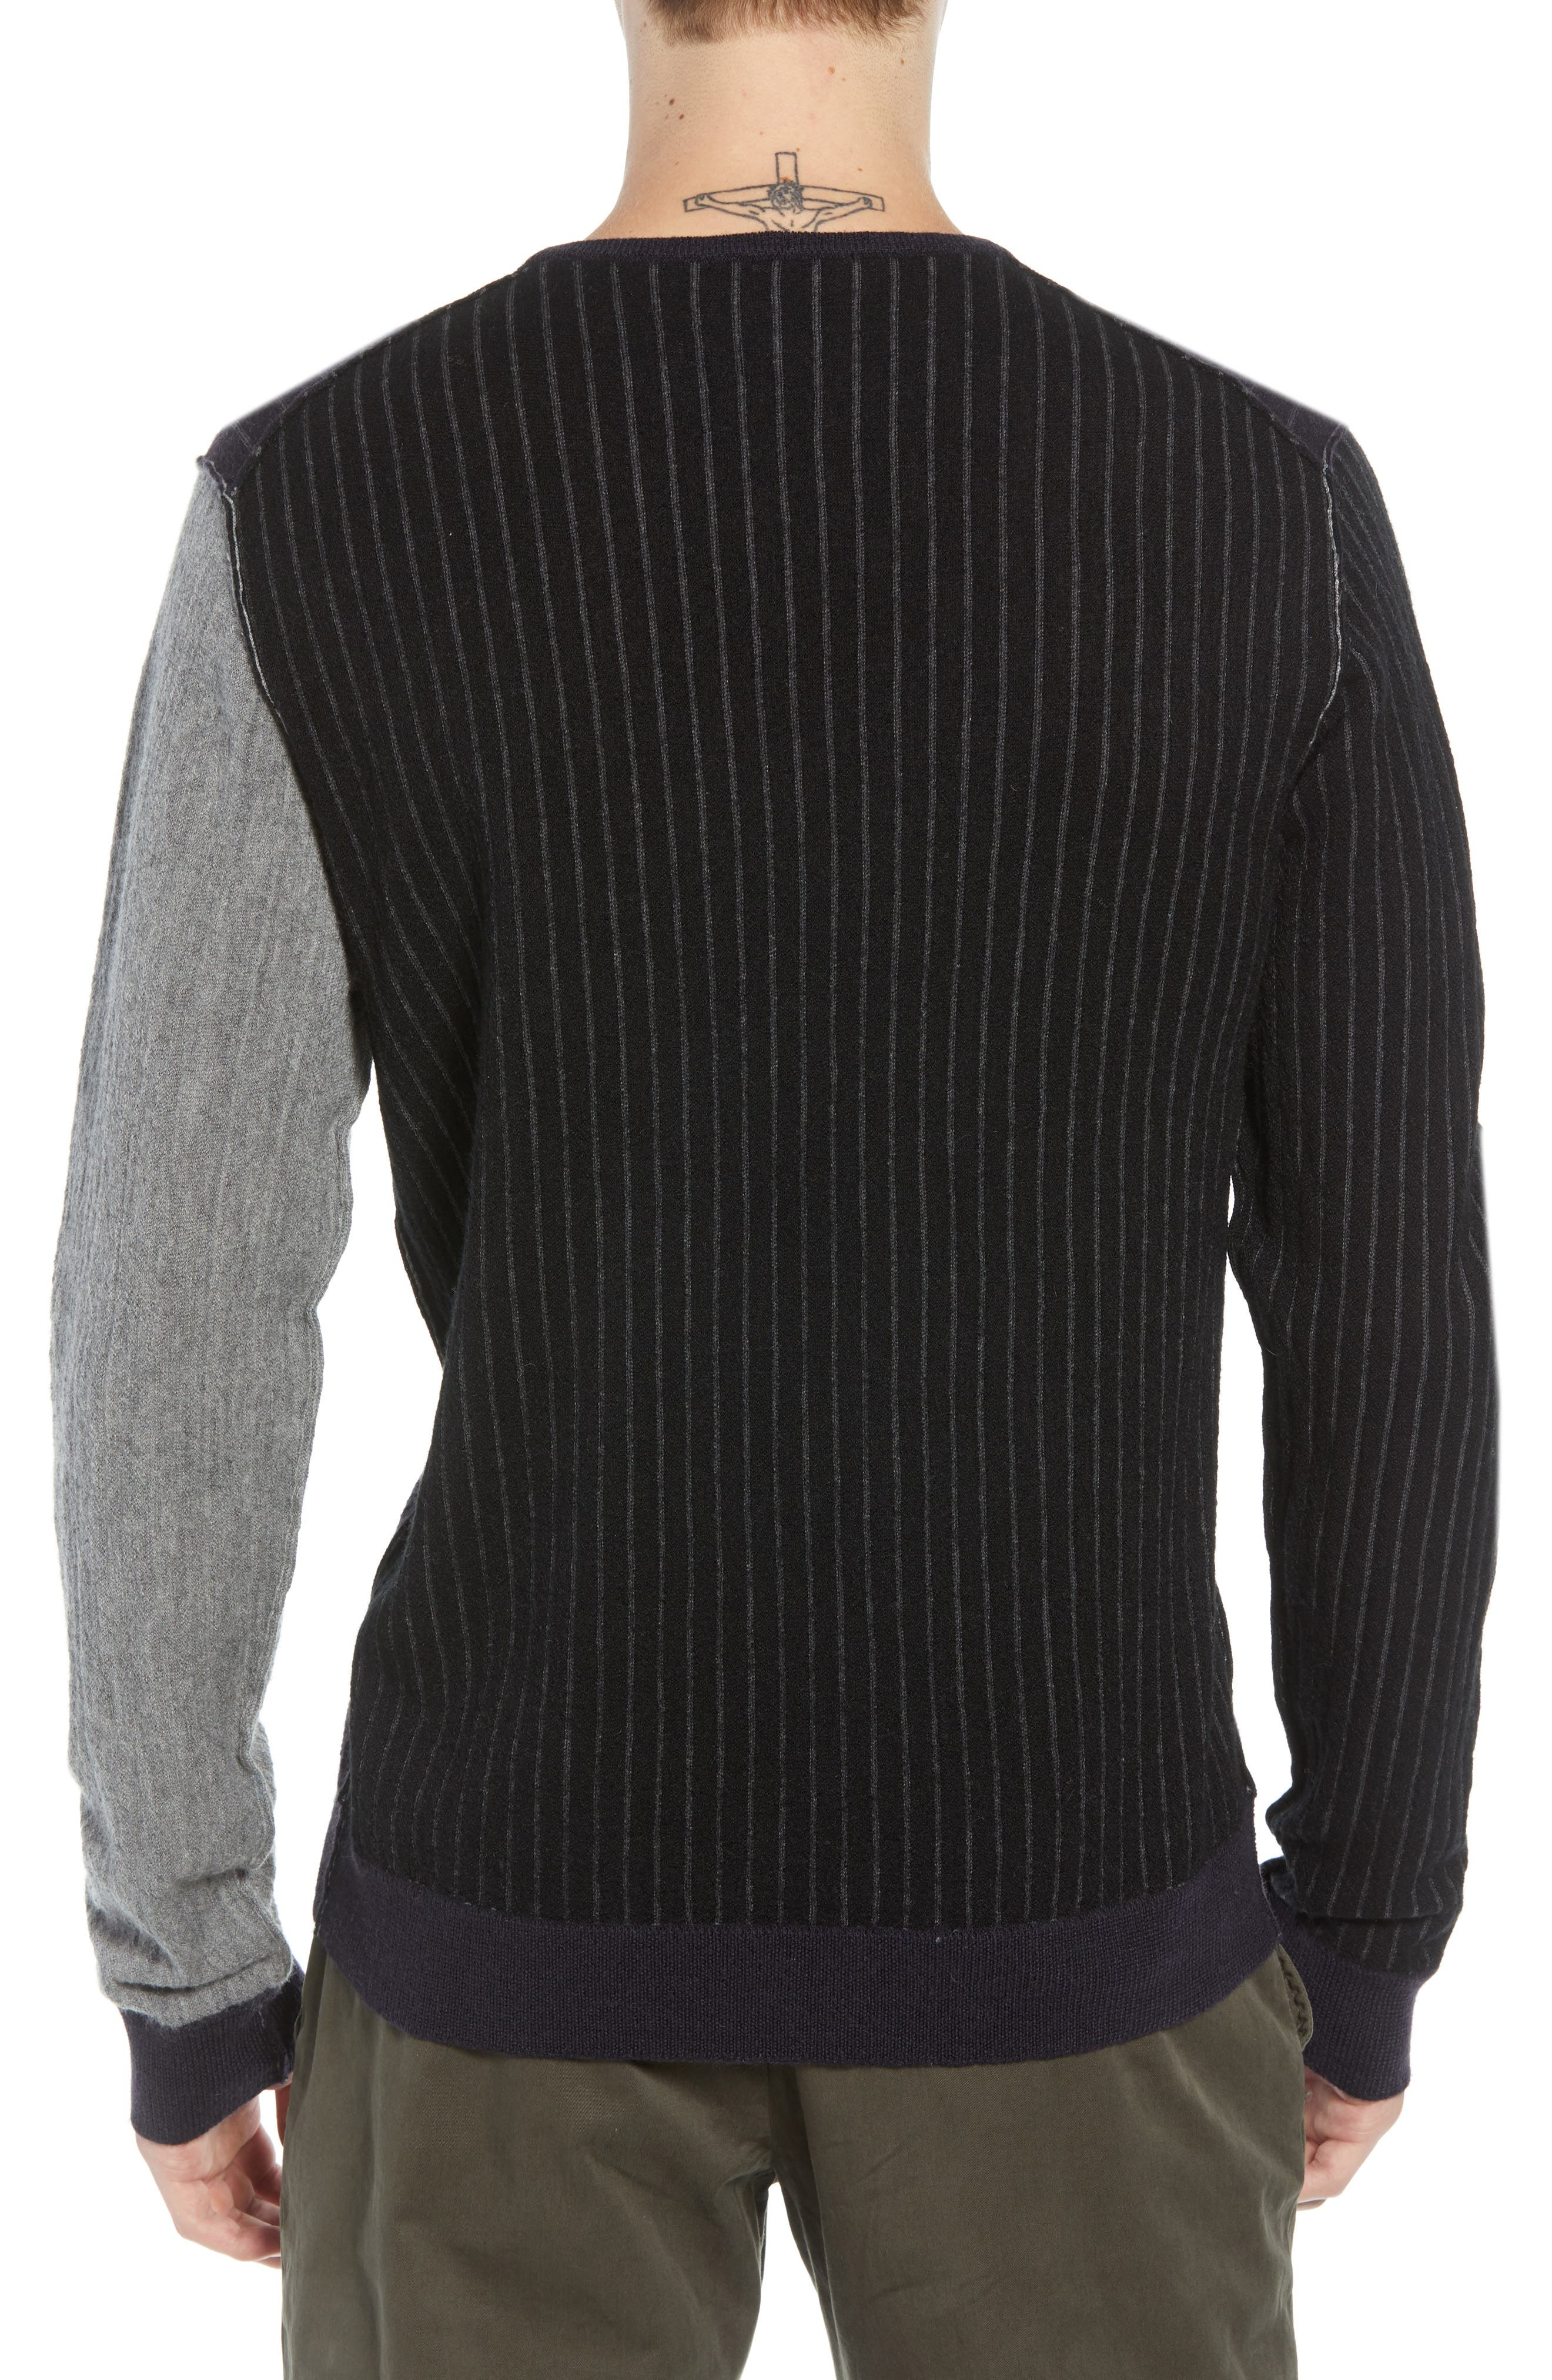 Boiled Wool Blend Crewneck Sweater,                             Alternate thumbnail 2, color,                             MULTI STRIPE